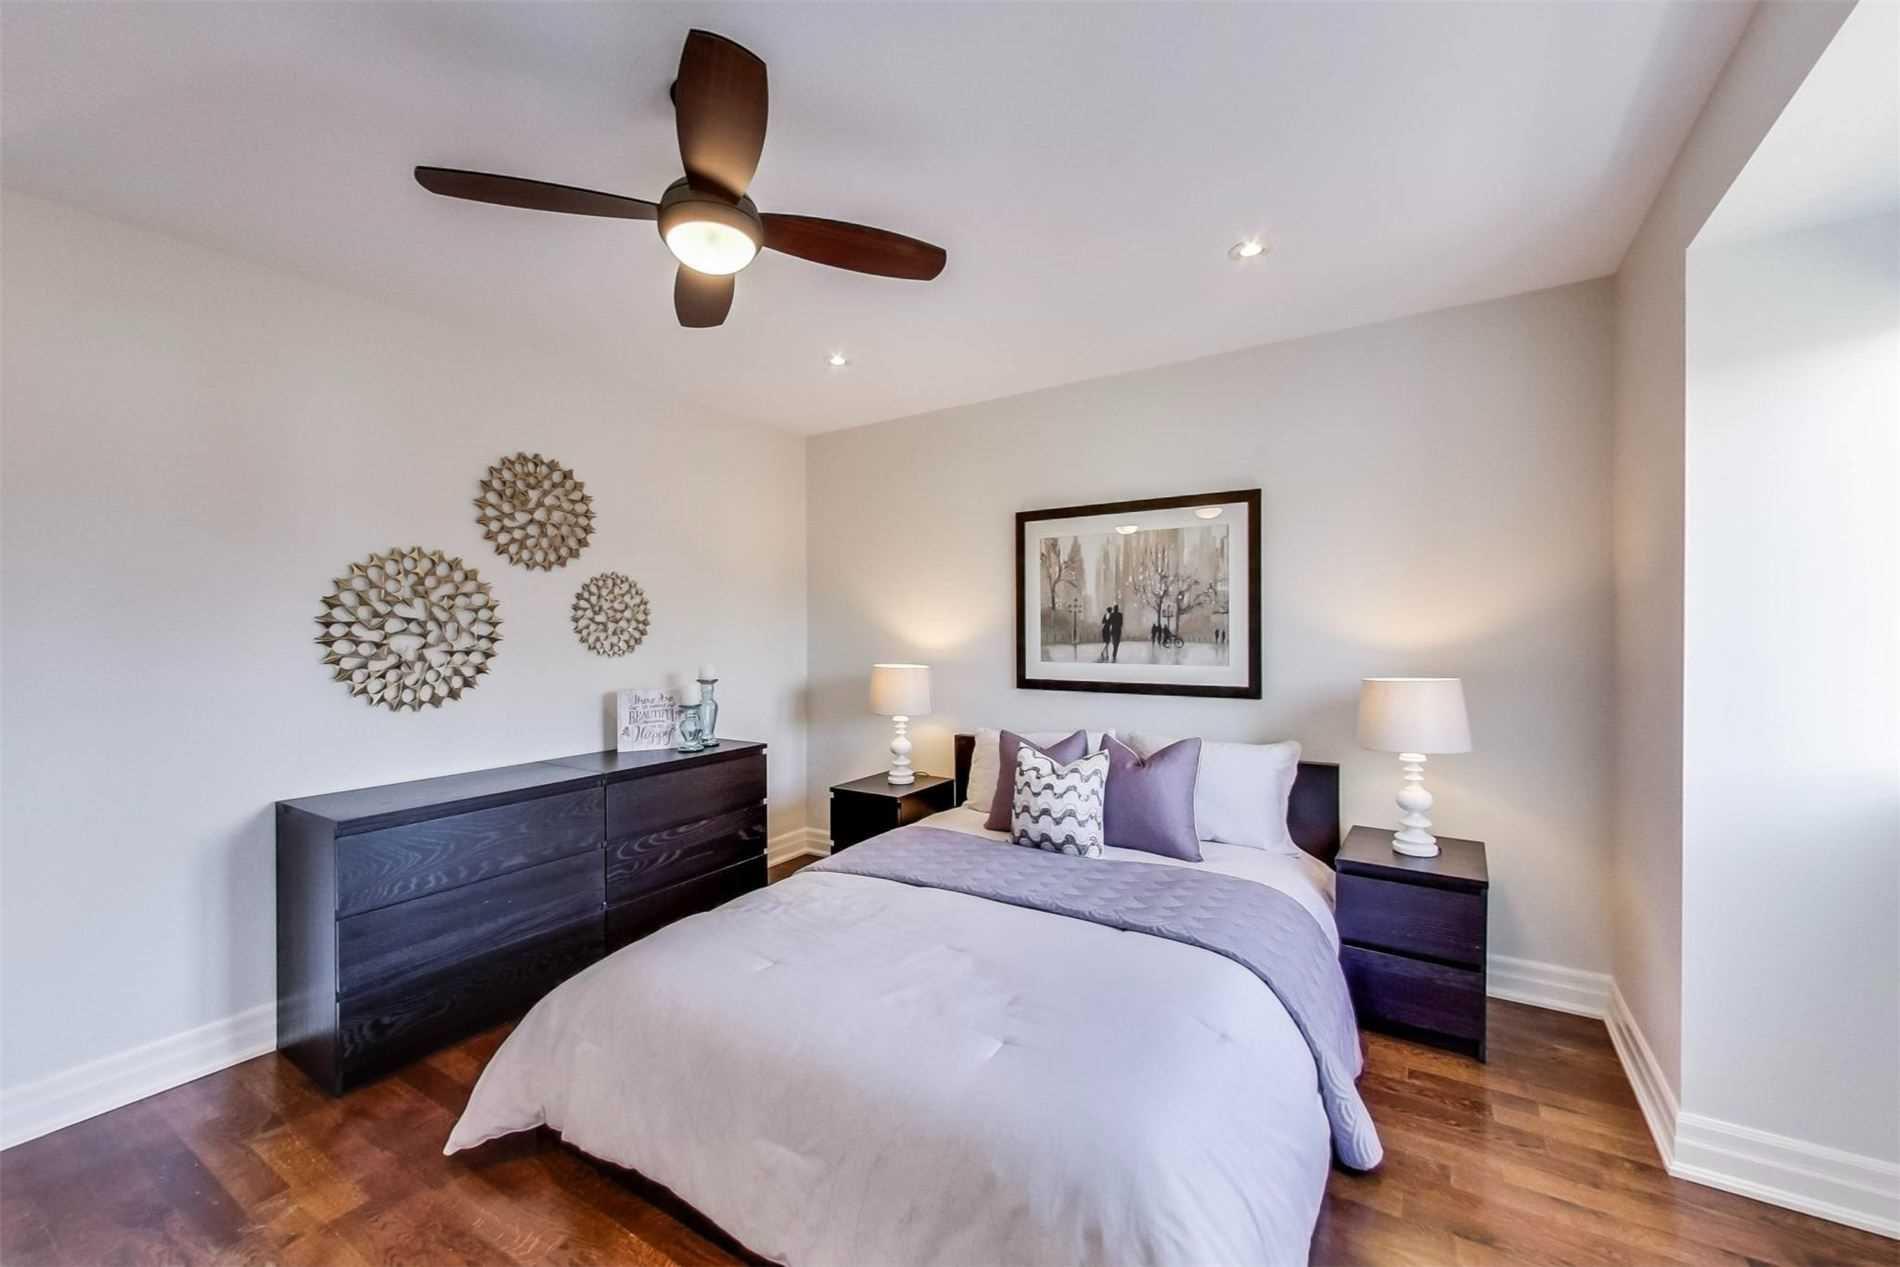 Photo 21: Photos: 213 Heward Avenue in Toronto: South Riverdale House (3-Storey) for sale (Toronto E01)  : MLS®# E4941877